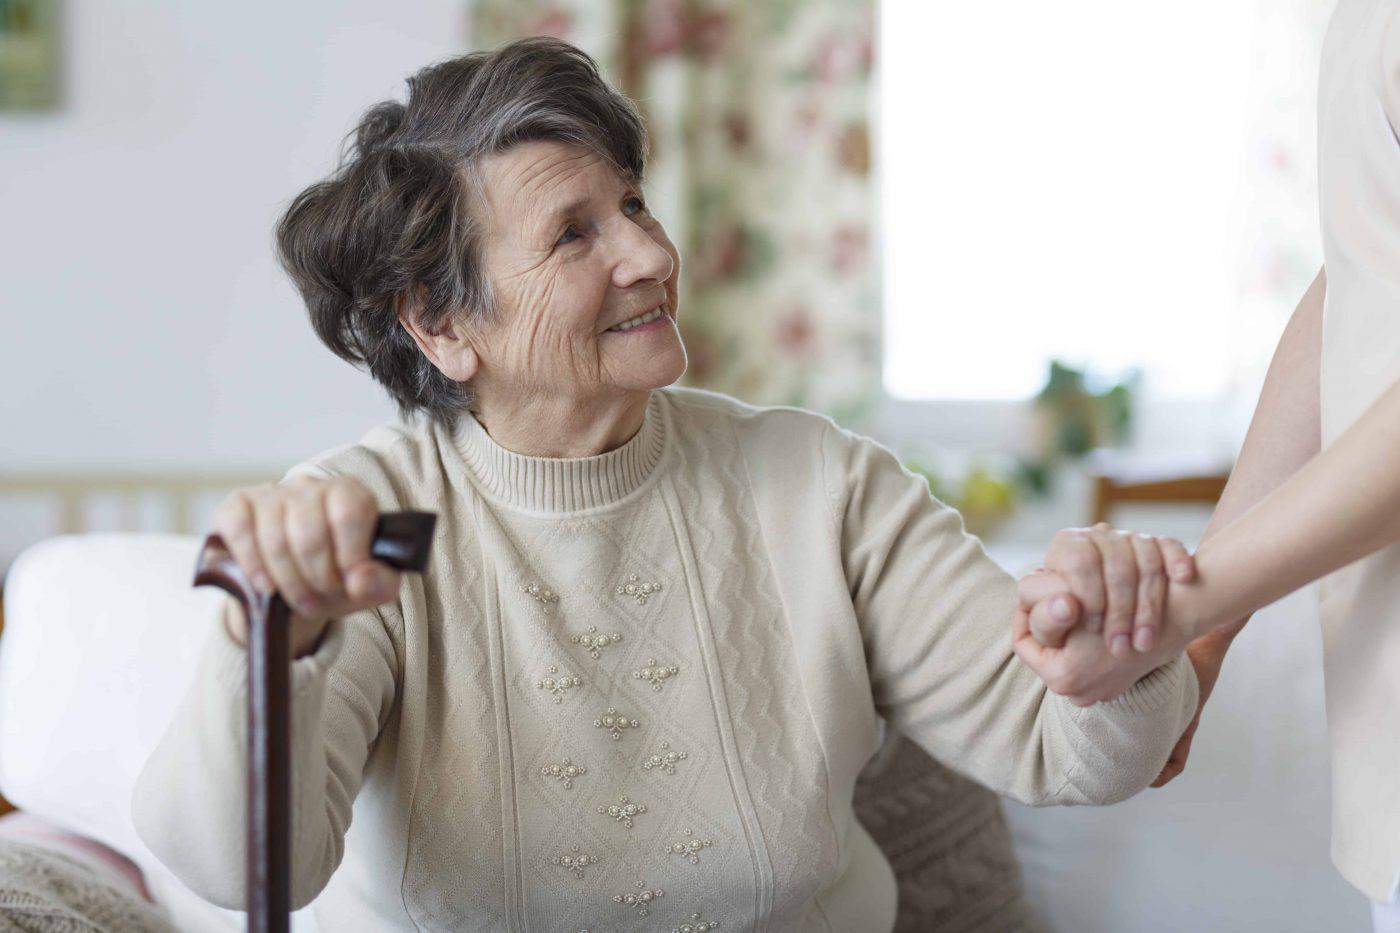 Smiling senior woman holding a cane and looking at her caregiver - senior woman looking at her caregiver P28Y4DY o9i5p68a3r91vxvfx4rklrh6dlo3dgqoepldfbcfw2 - Pflegebedürftigkeit